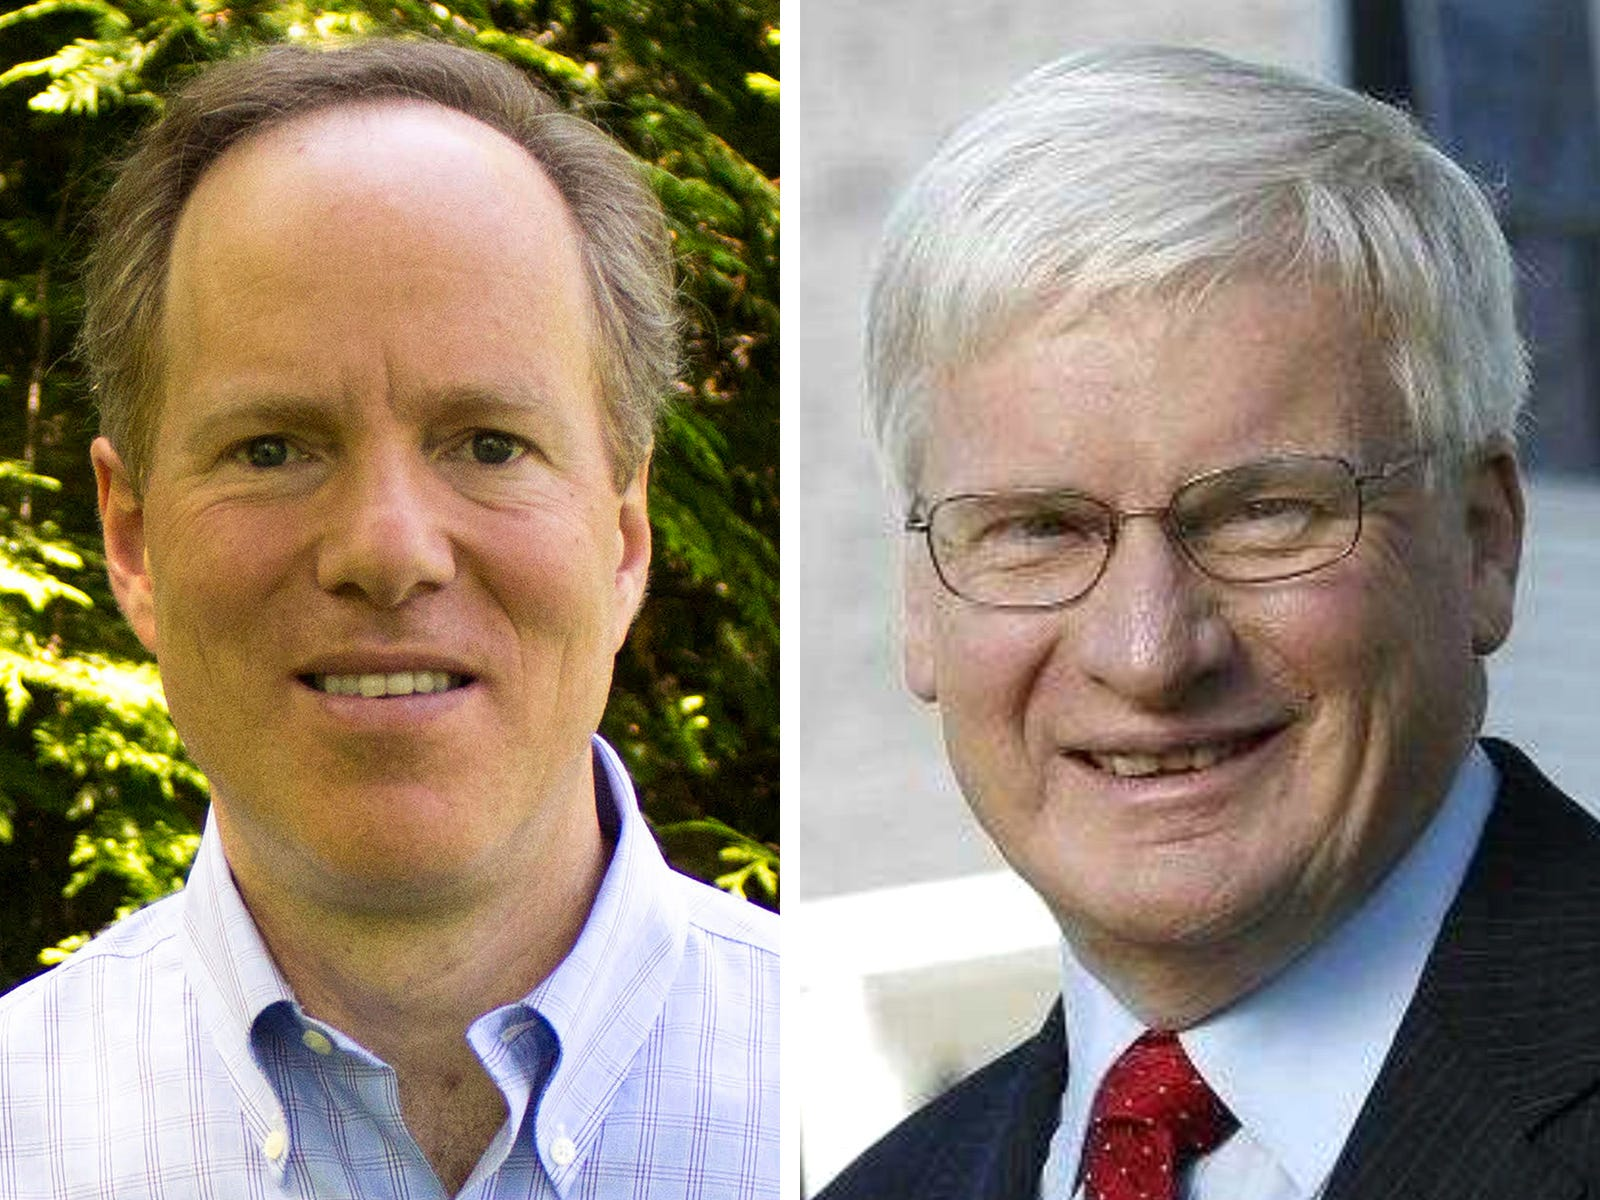 Incumbent Glenn Grothman defeats Democratic challenger Dan Kohl to retain House seat